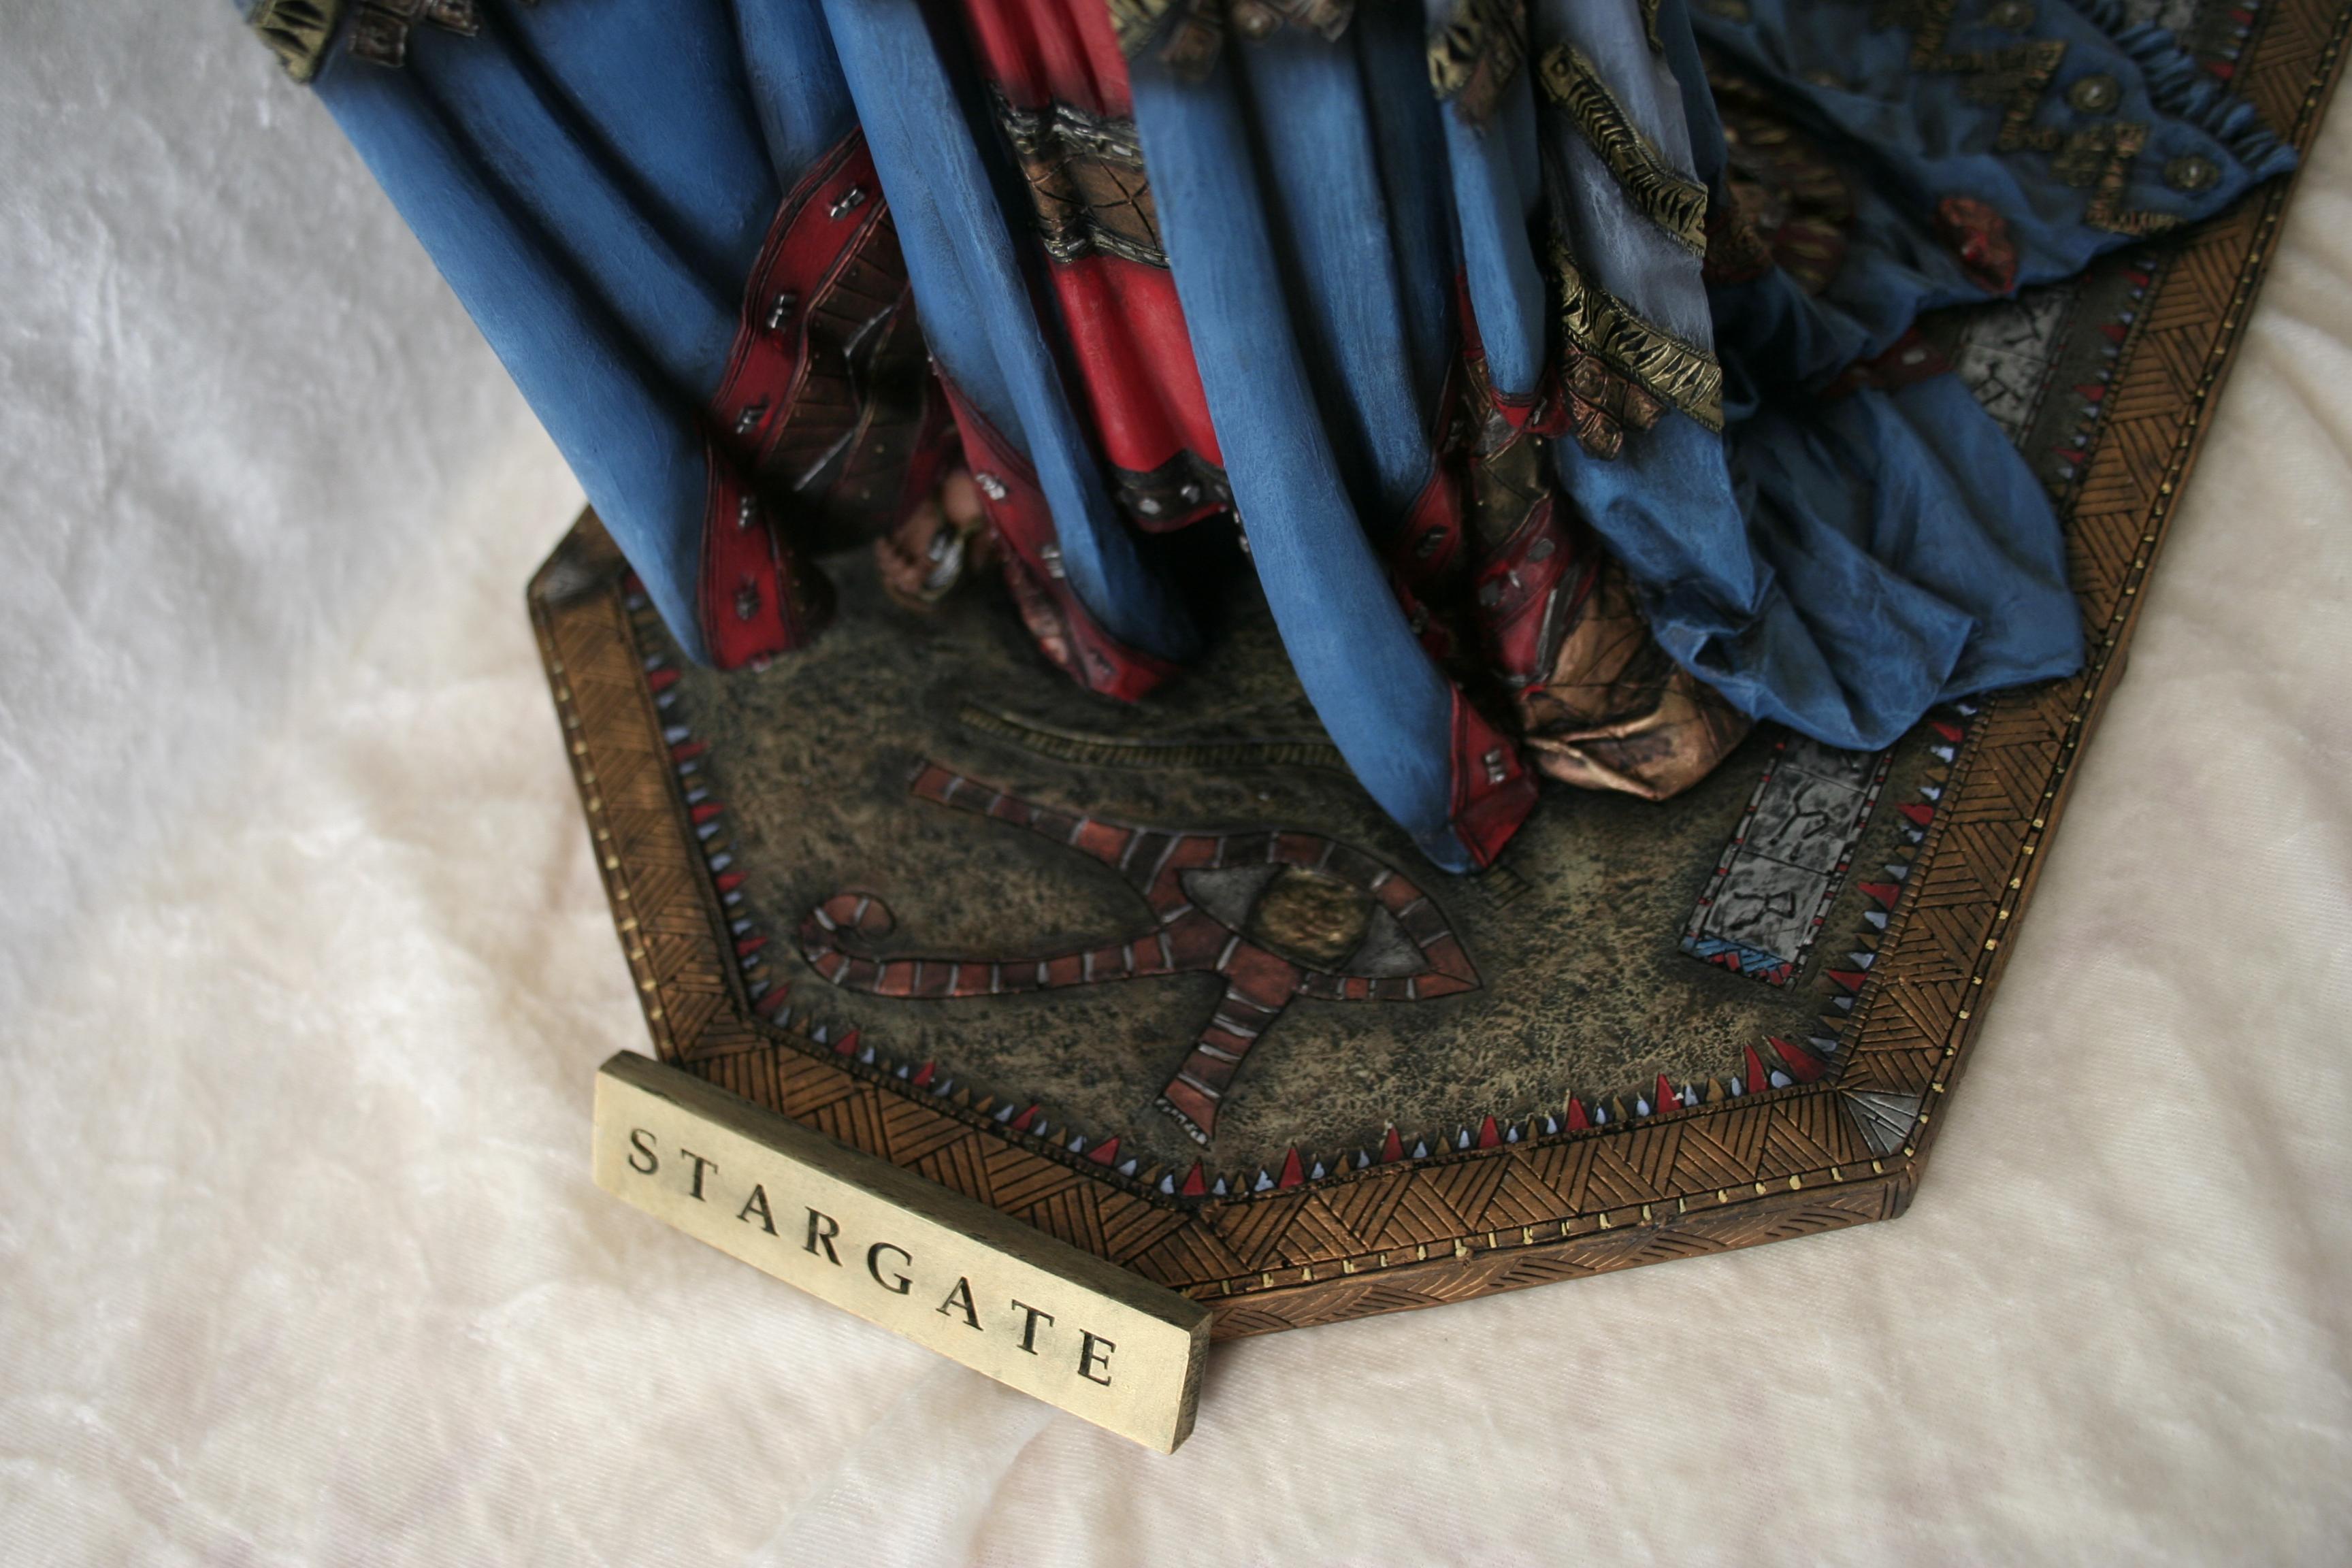 Stargate : Ra  _mg_0428-48ce568